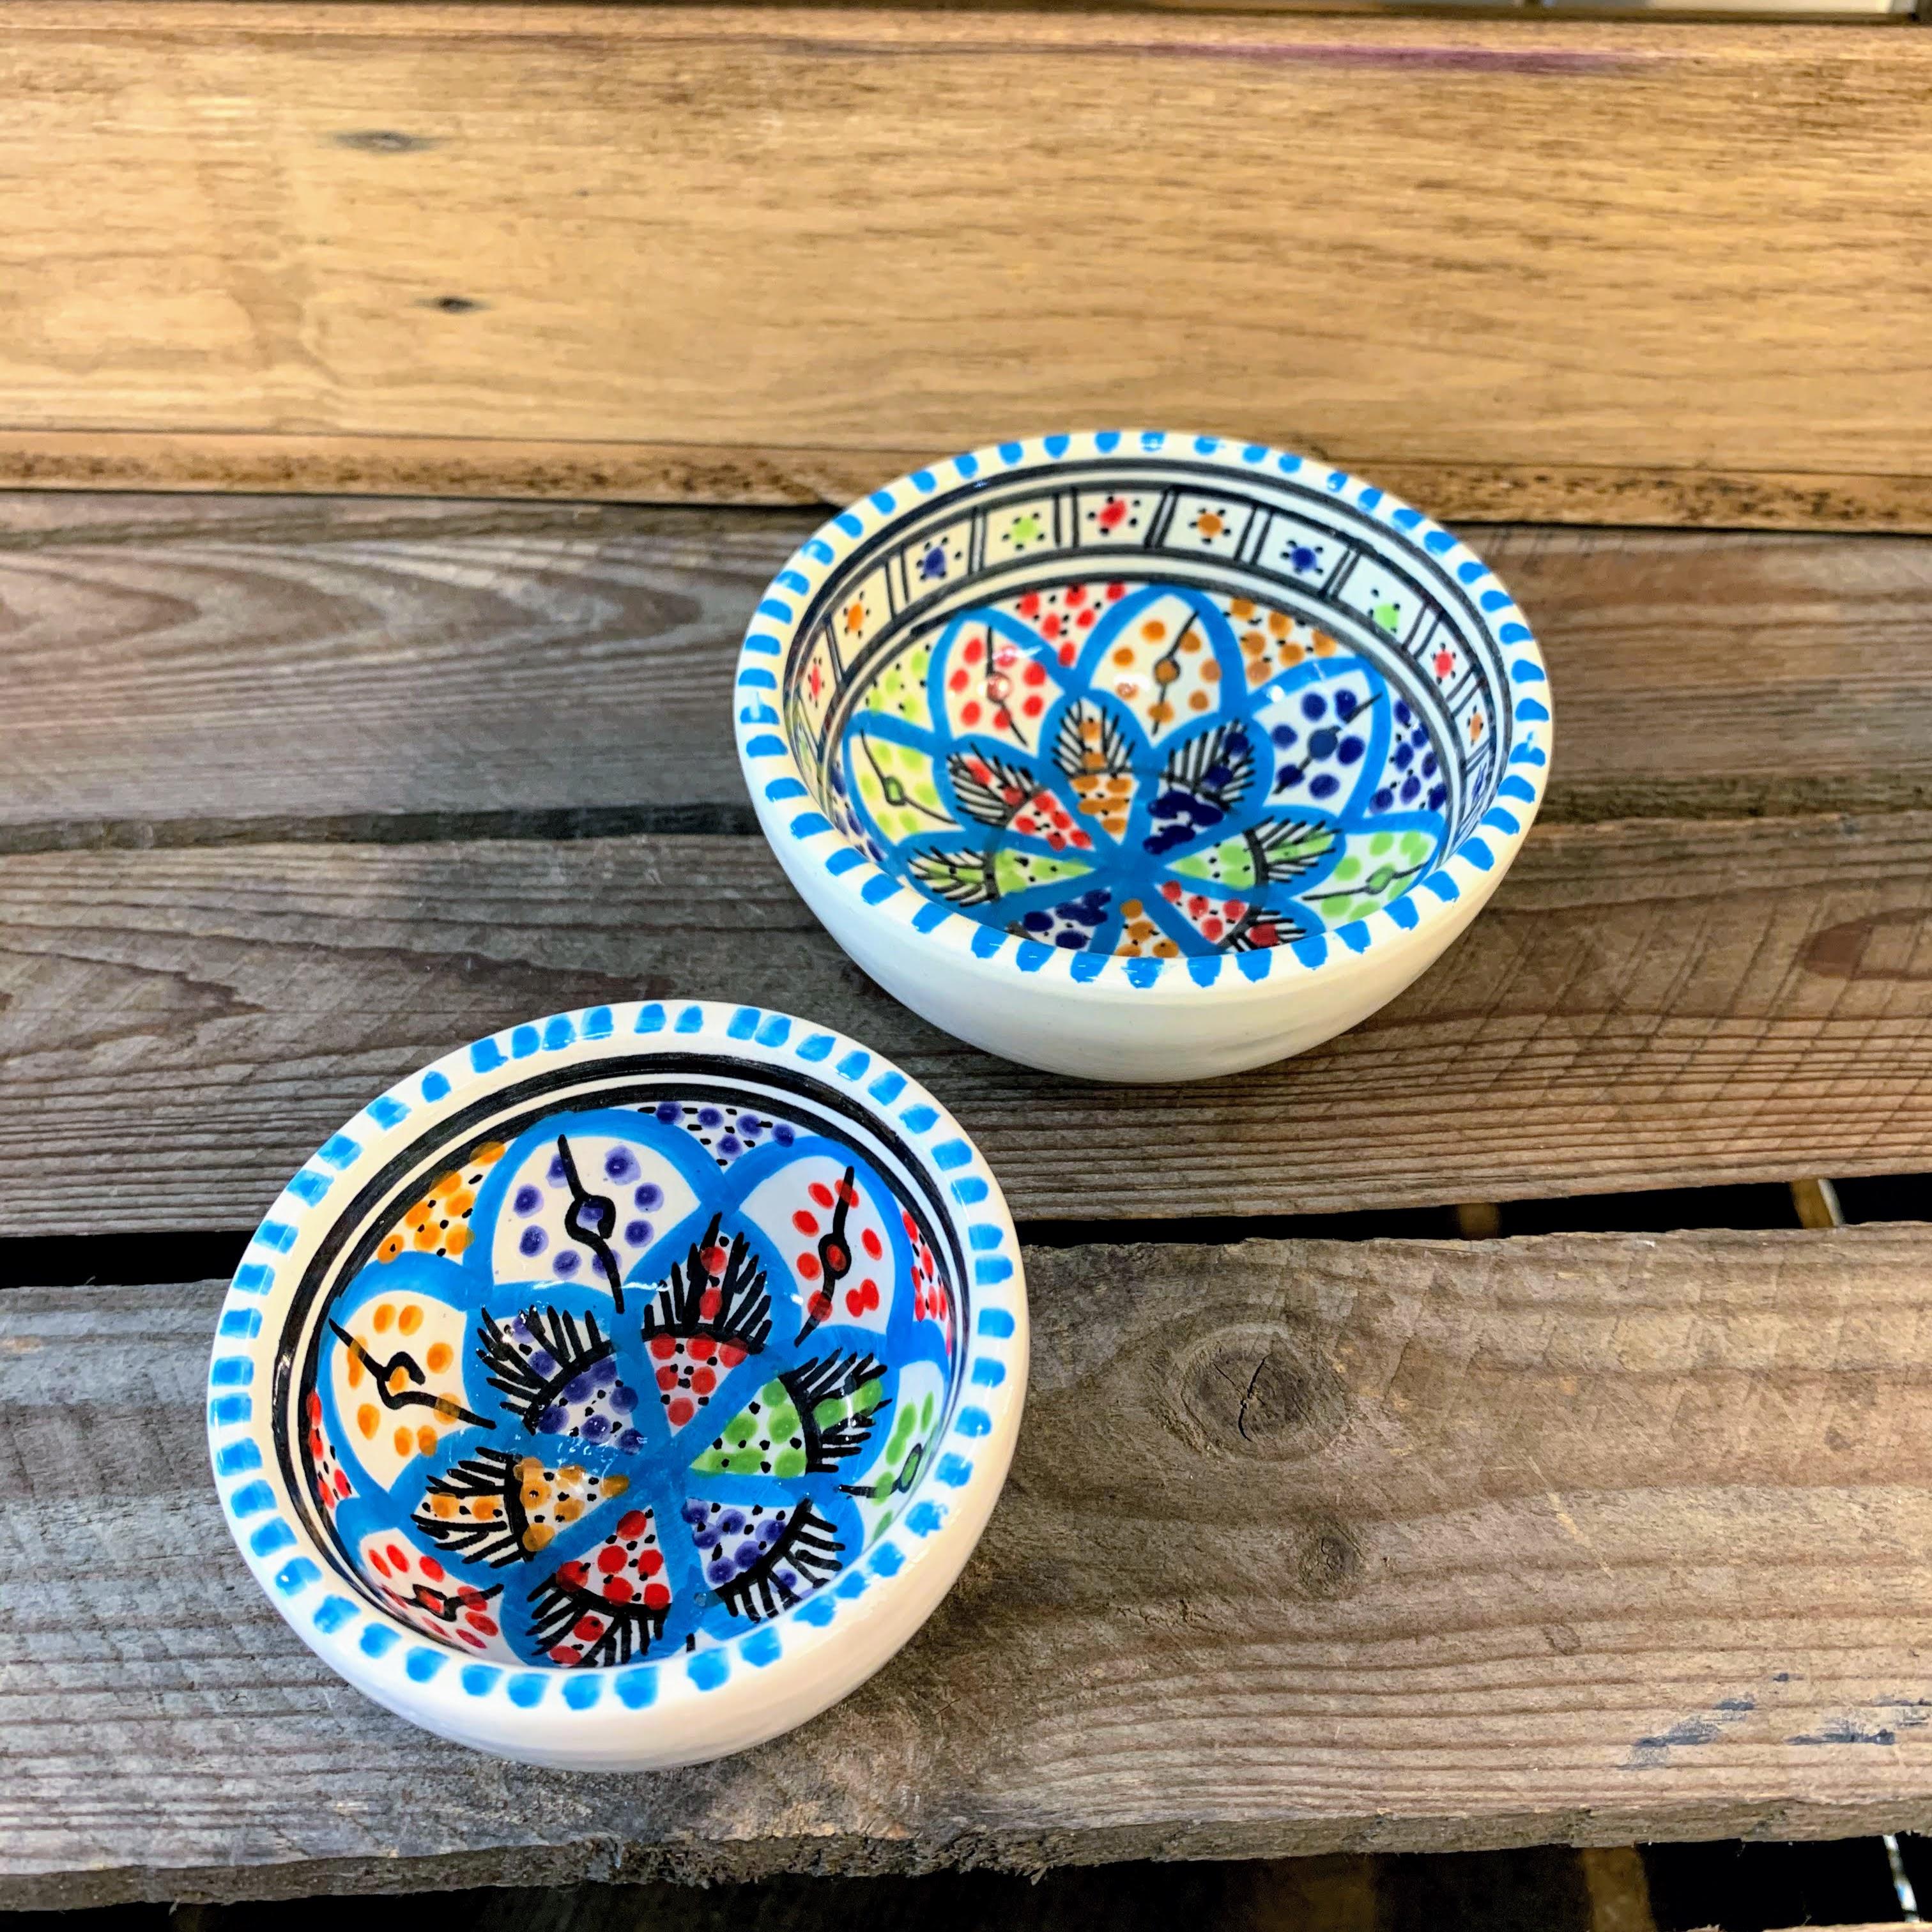 Tunisian Hand Painted Bowls - Dip